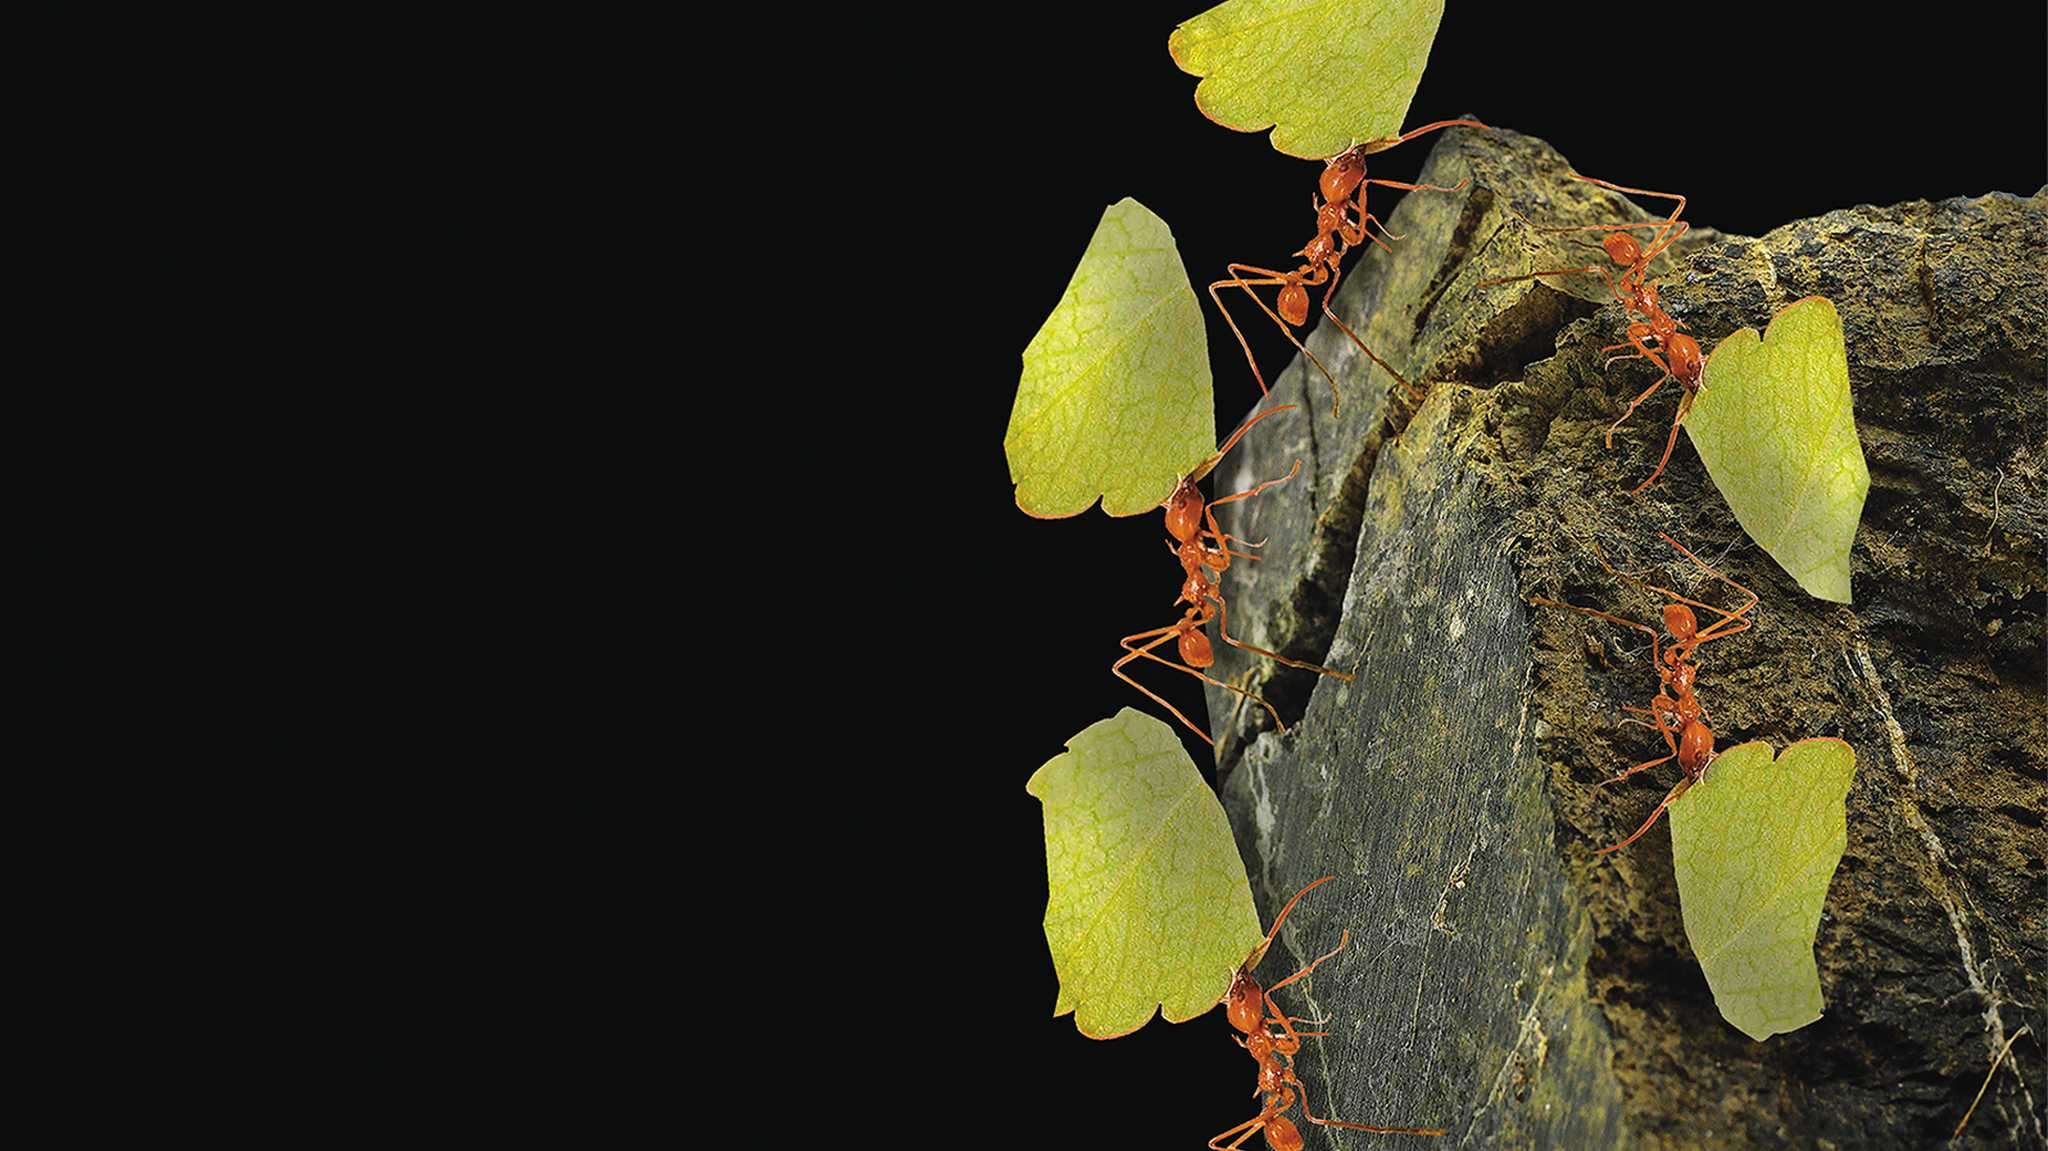 Ameisenprinzip: Microservices ersetzen den Monolithen